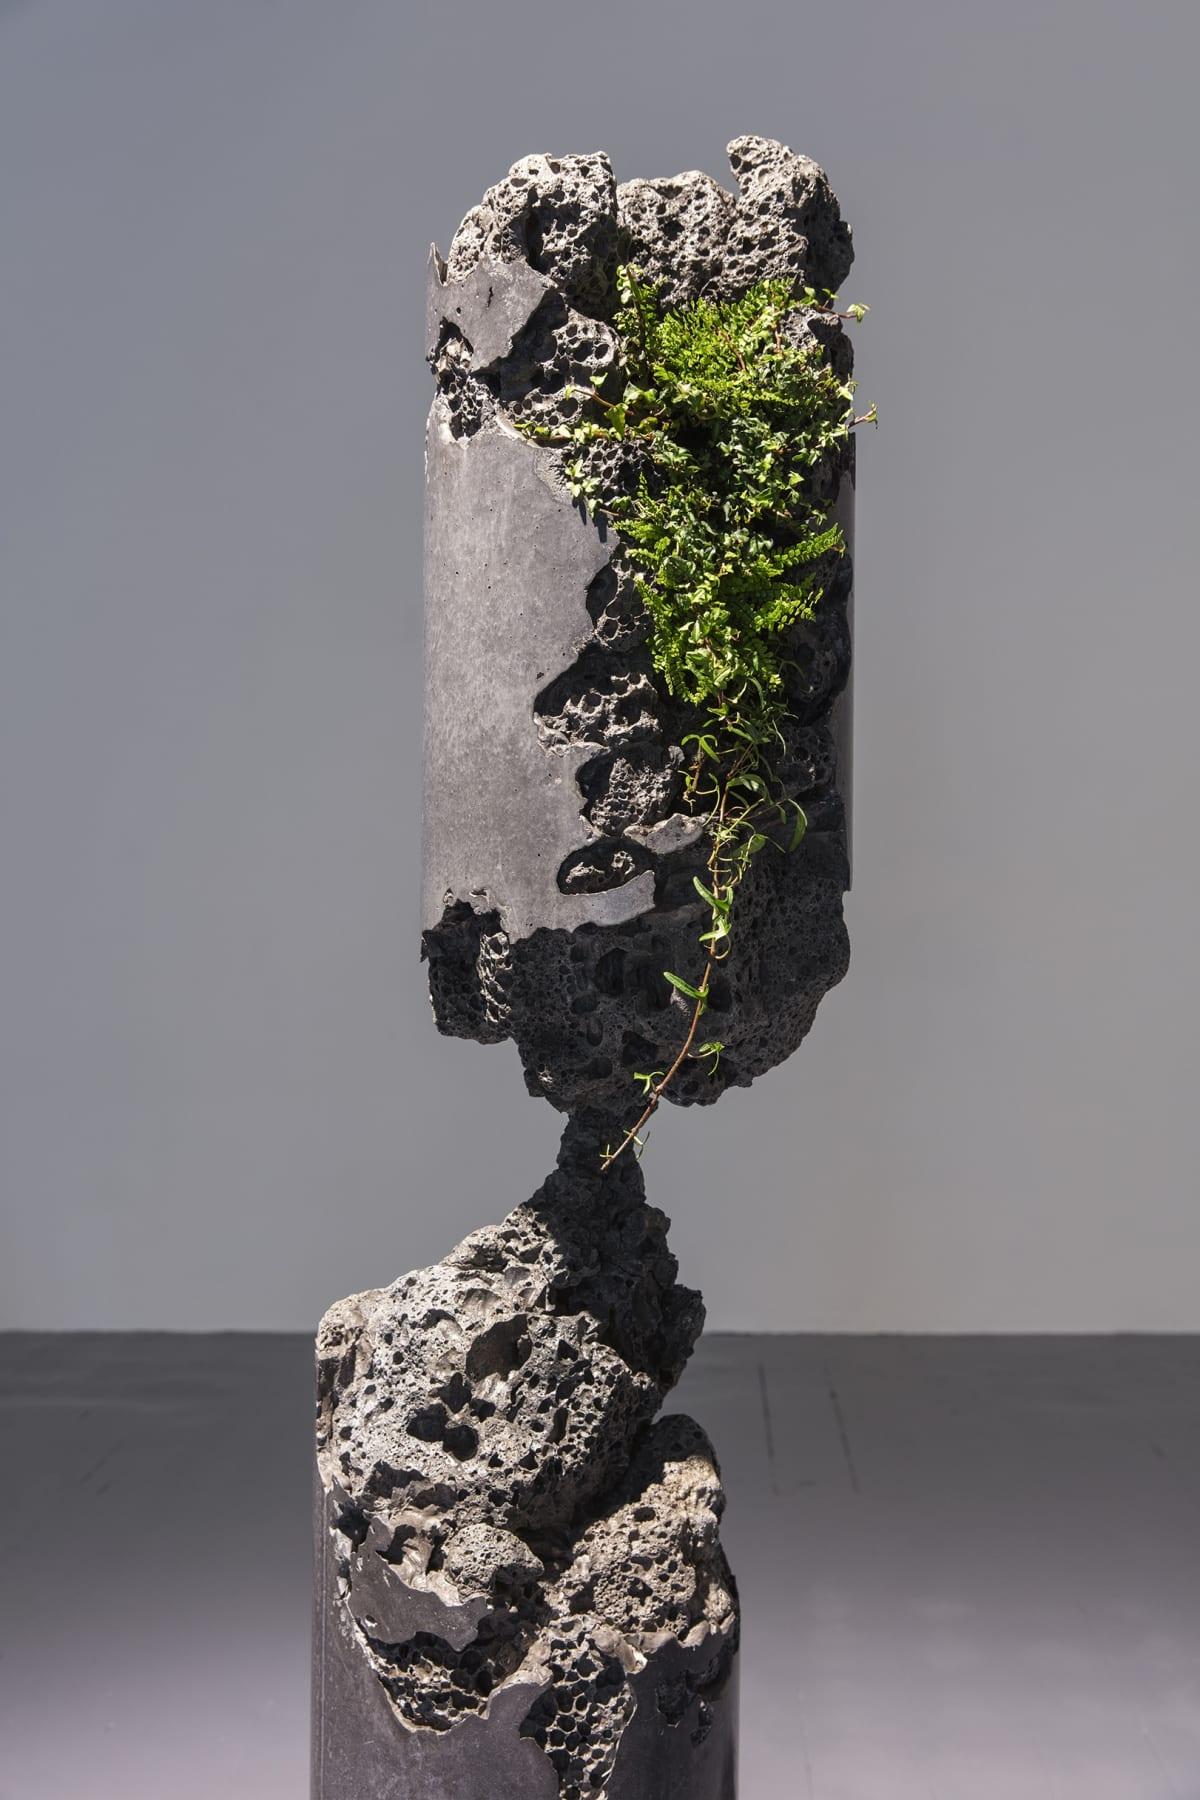 Jamie North Forward Projection (detail), 2019 Concrete, blast furnace slag, steel, epoxy and plants 300 (diameter) x 160 cm